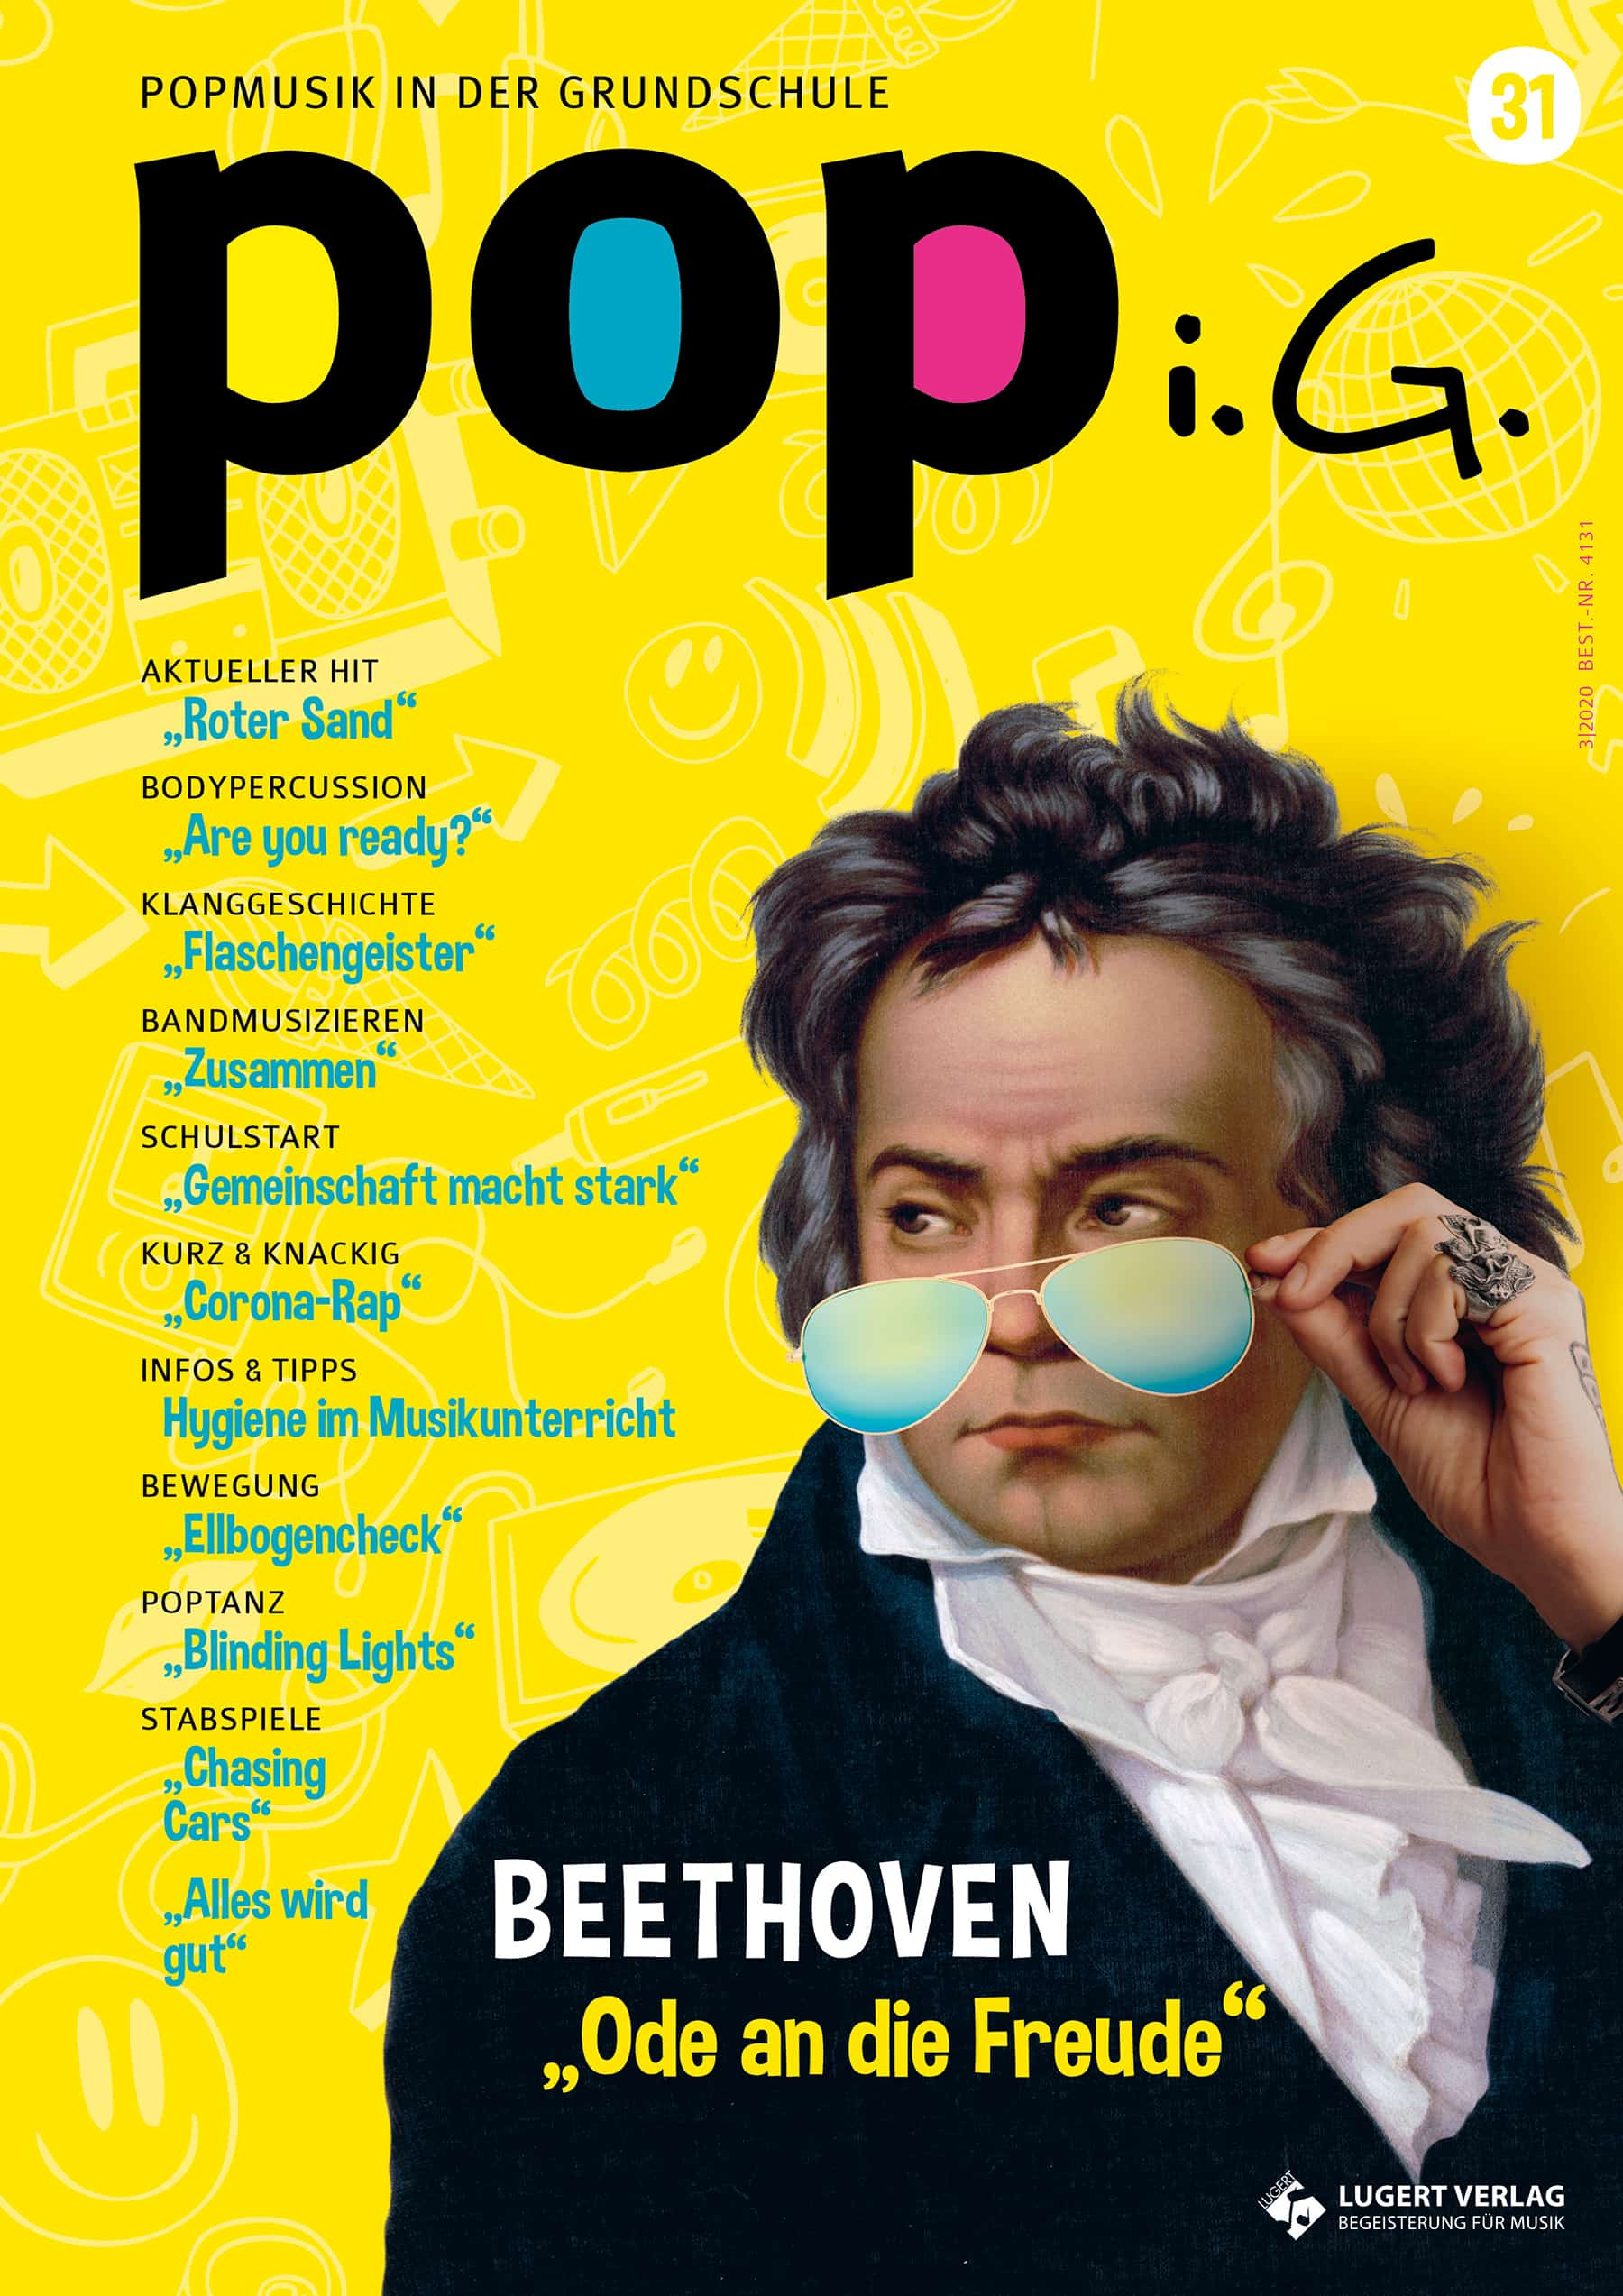 Popmusik in der Grundschule_Freude schöner Götterfunke